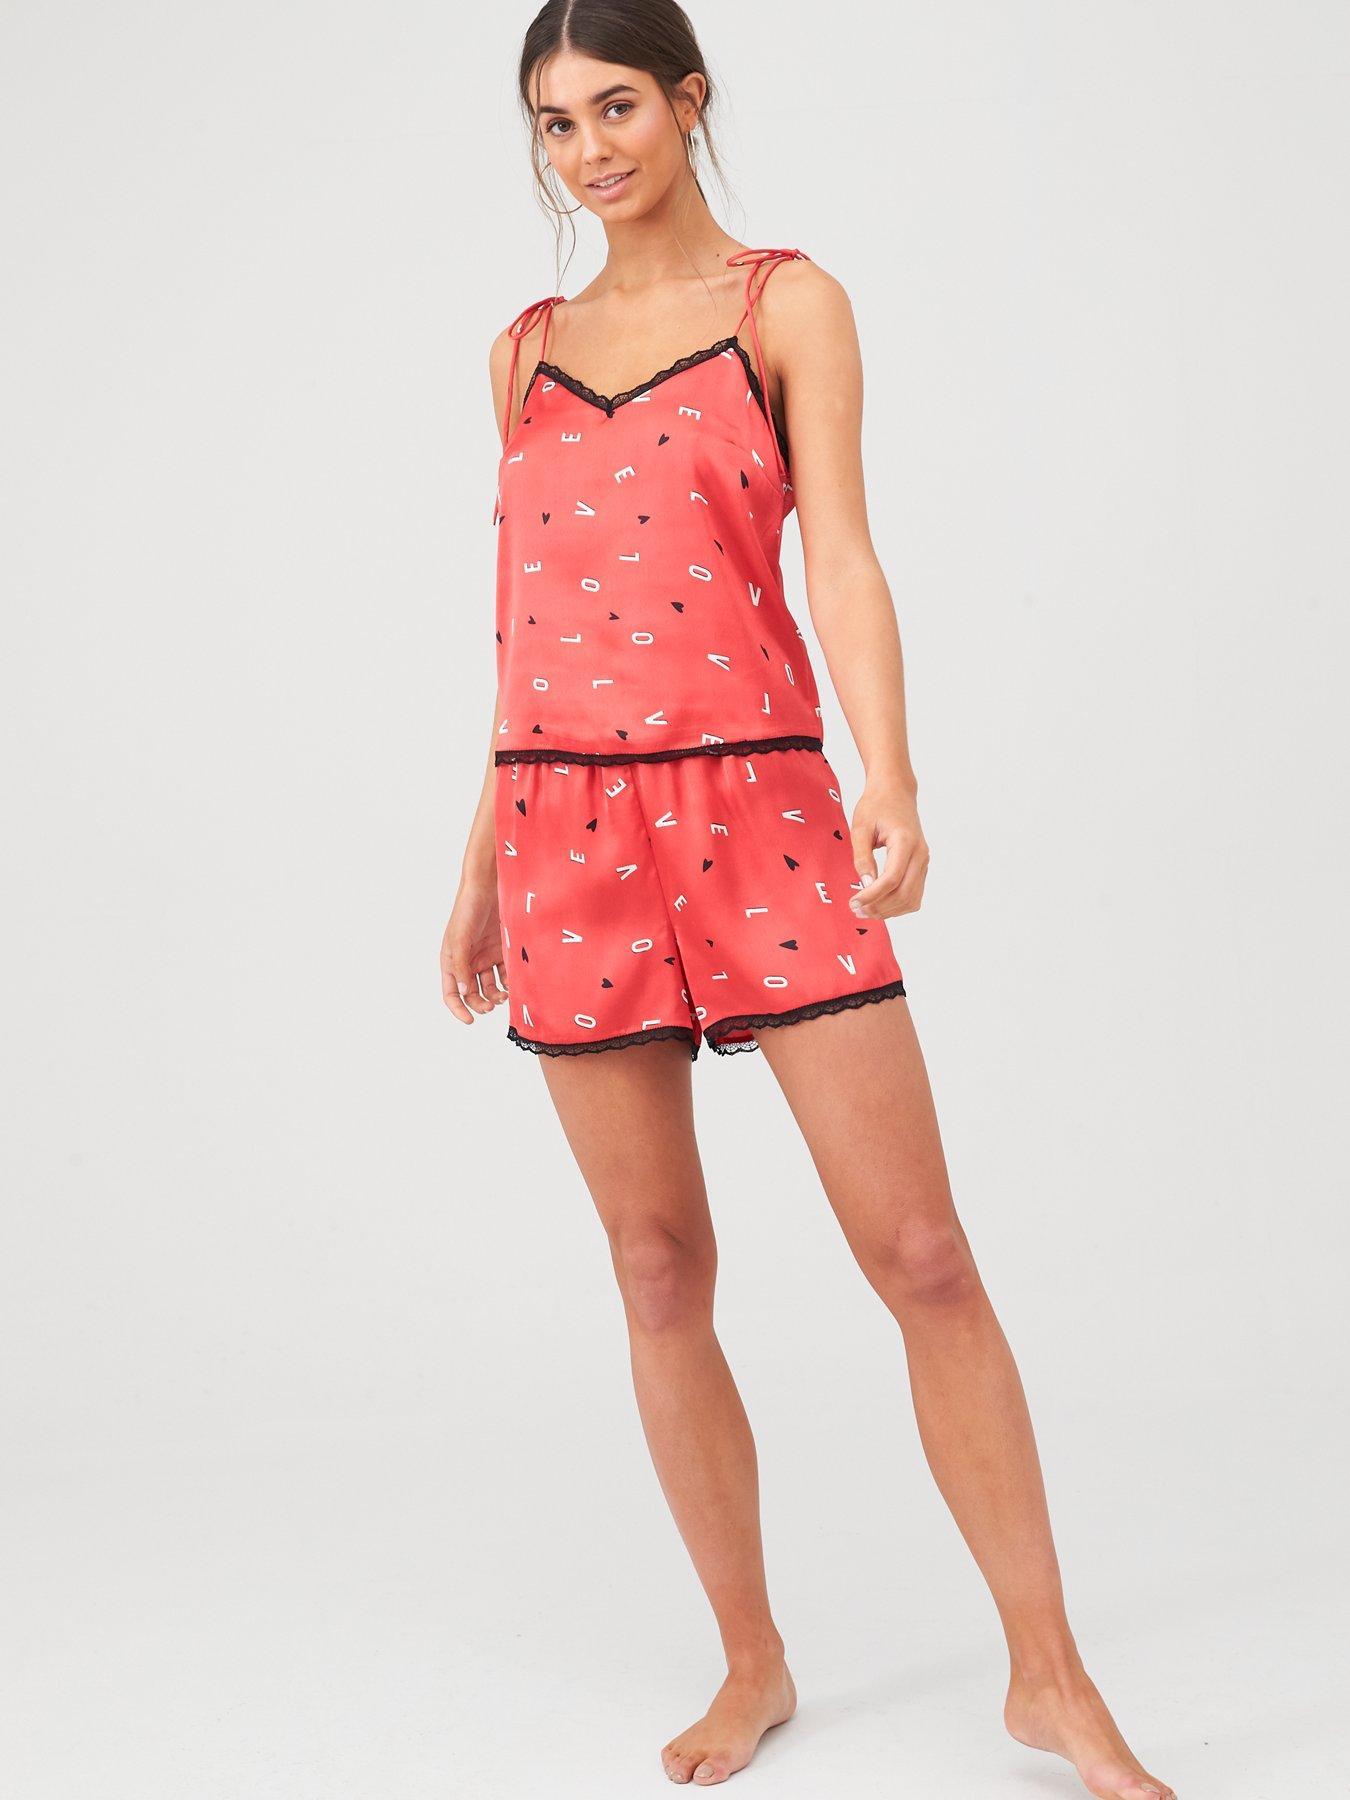 New Ann Summers Screw it Lets Do it Pyjamas Set Shorts /& T Shirt M 12 14 L16 18